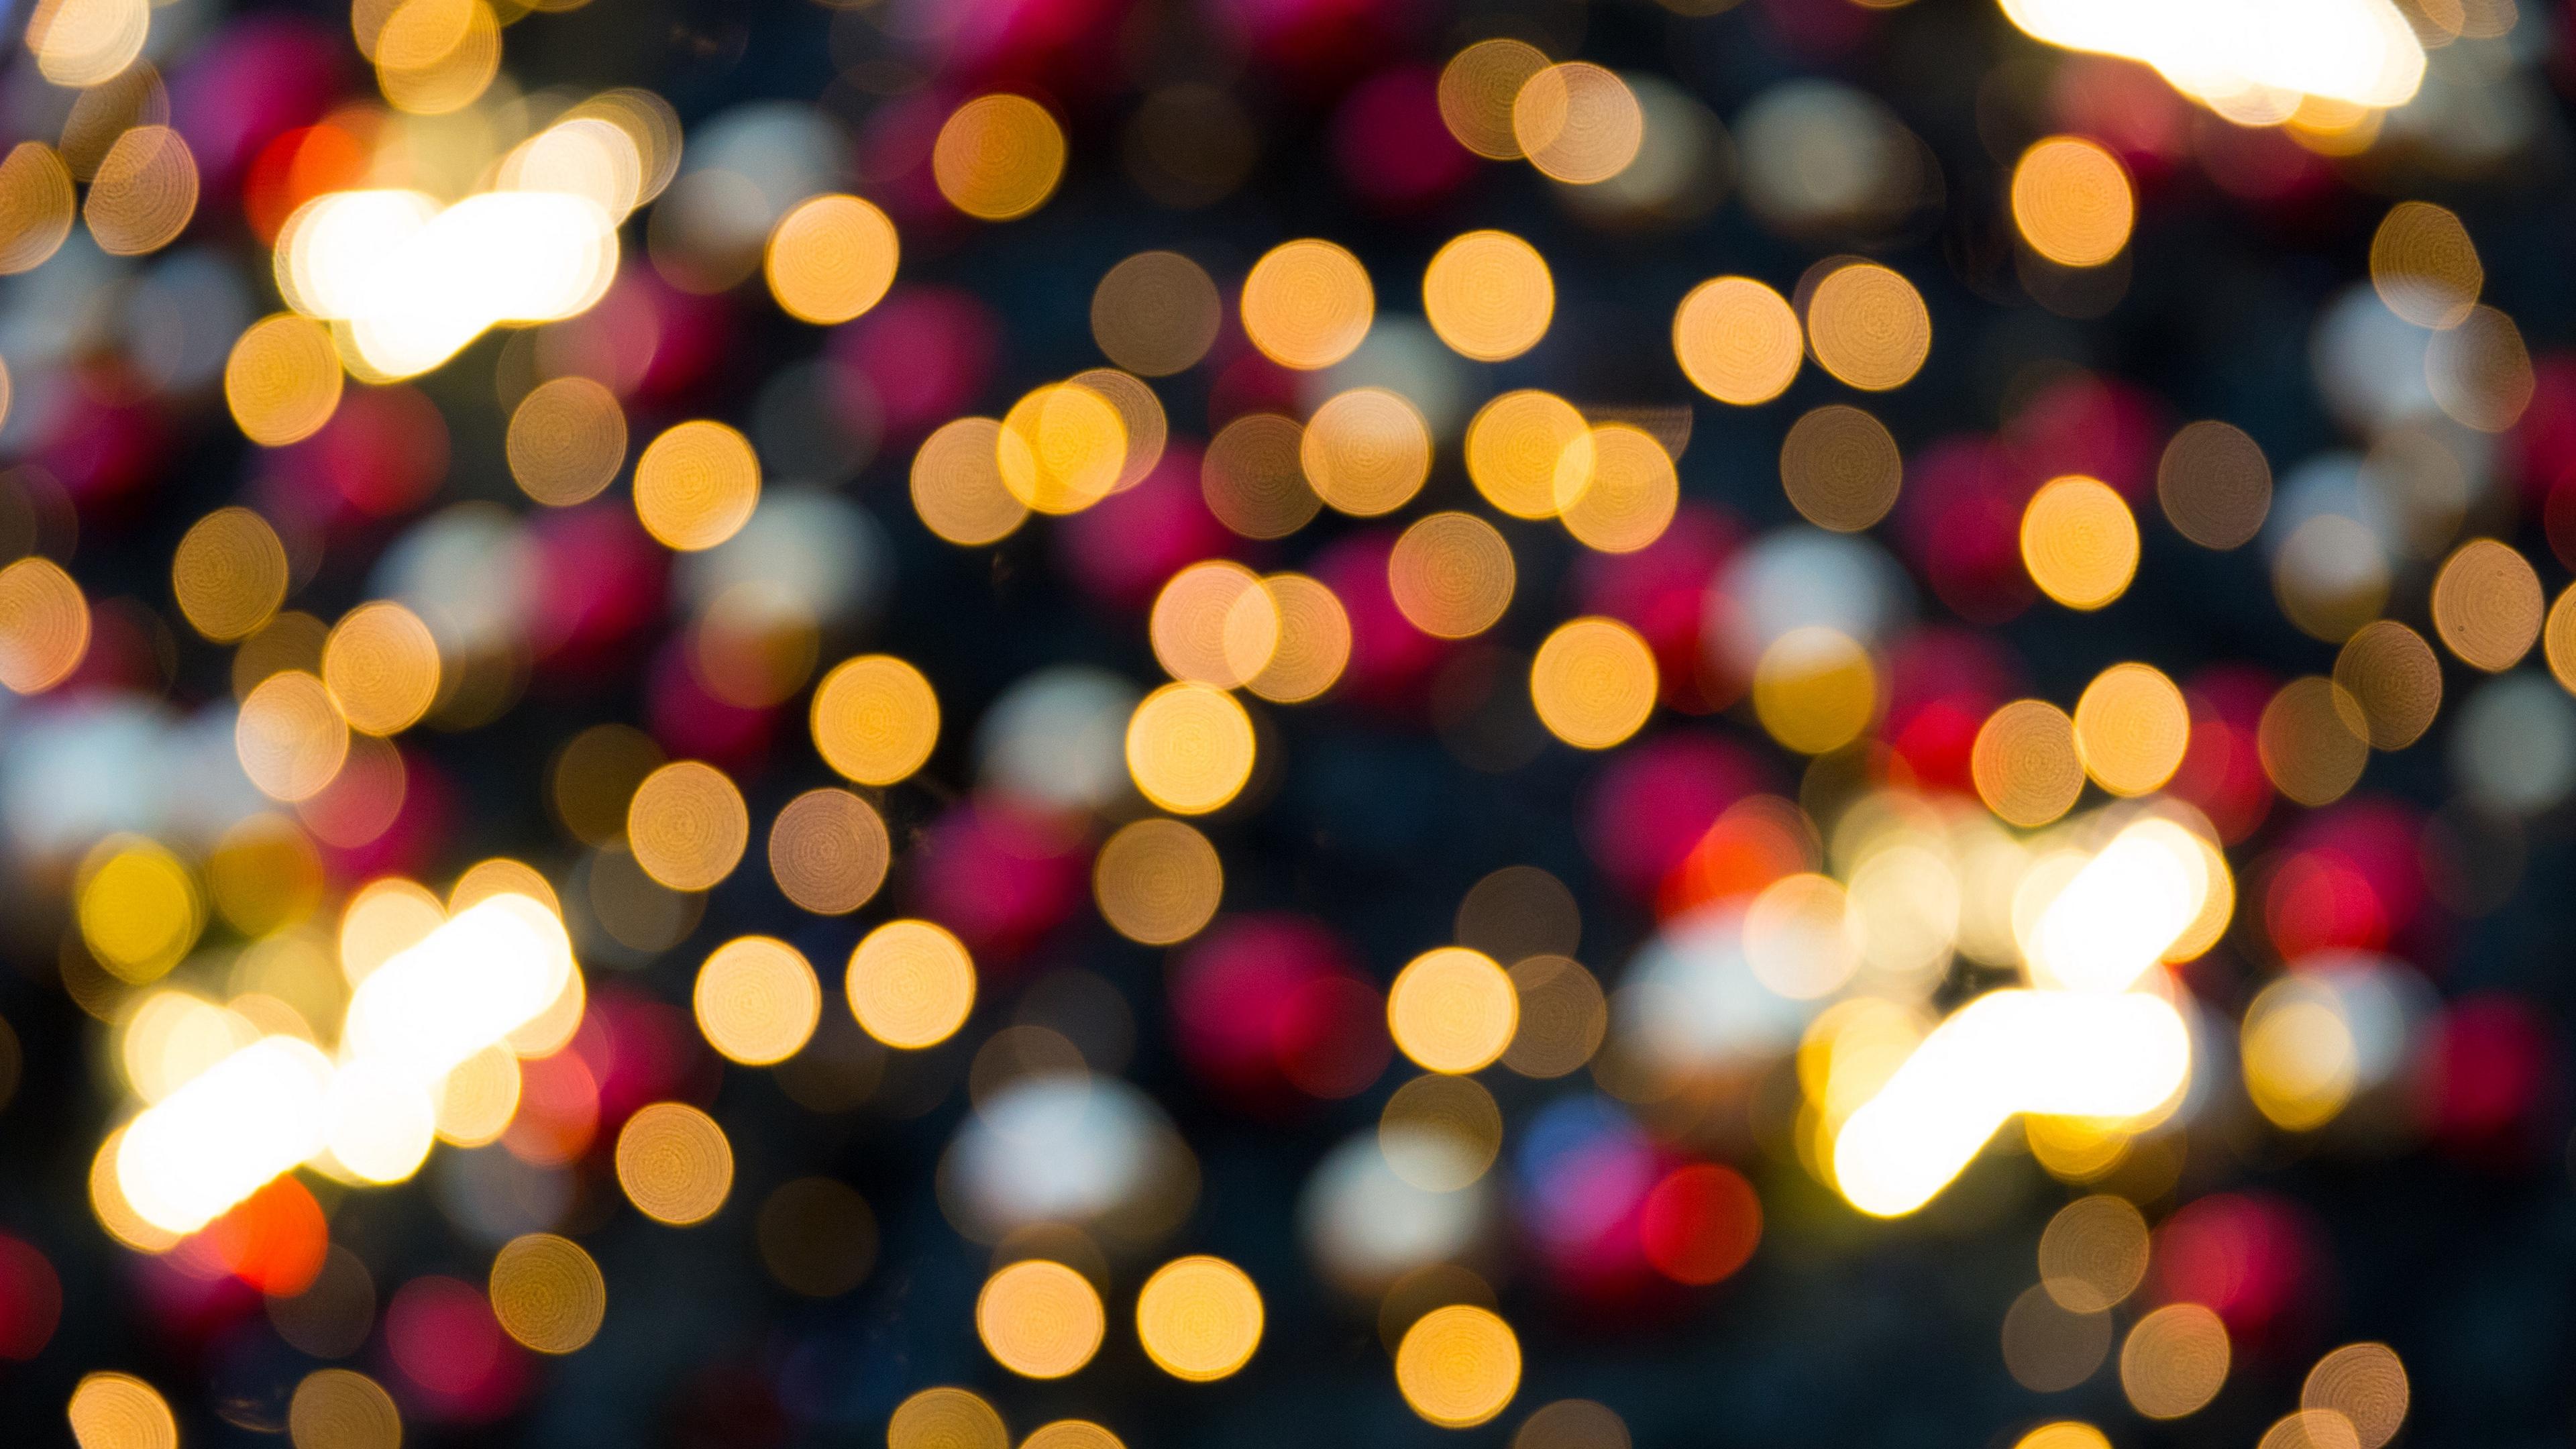 glare colorful abstract 4k 1539370473 - glare, colorful, abstract 4k - glare, Colorful, abstract